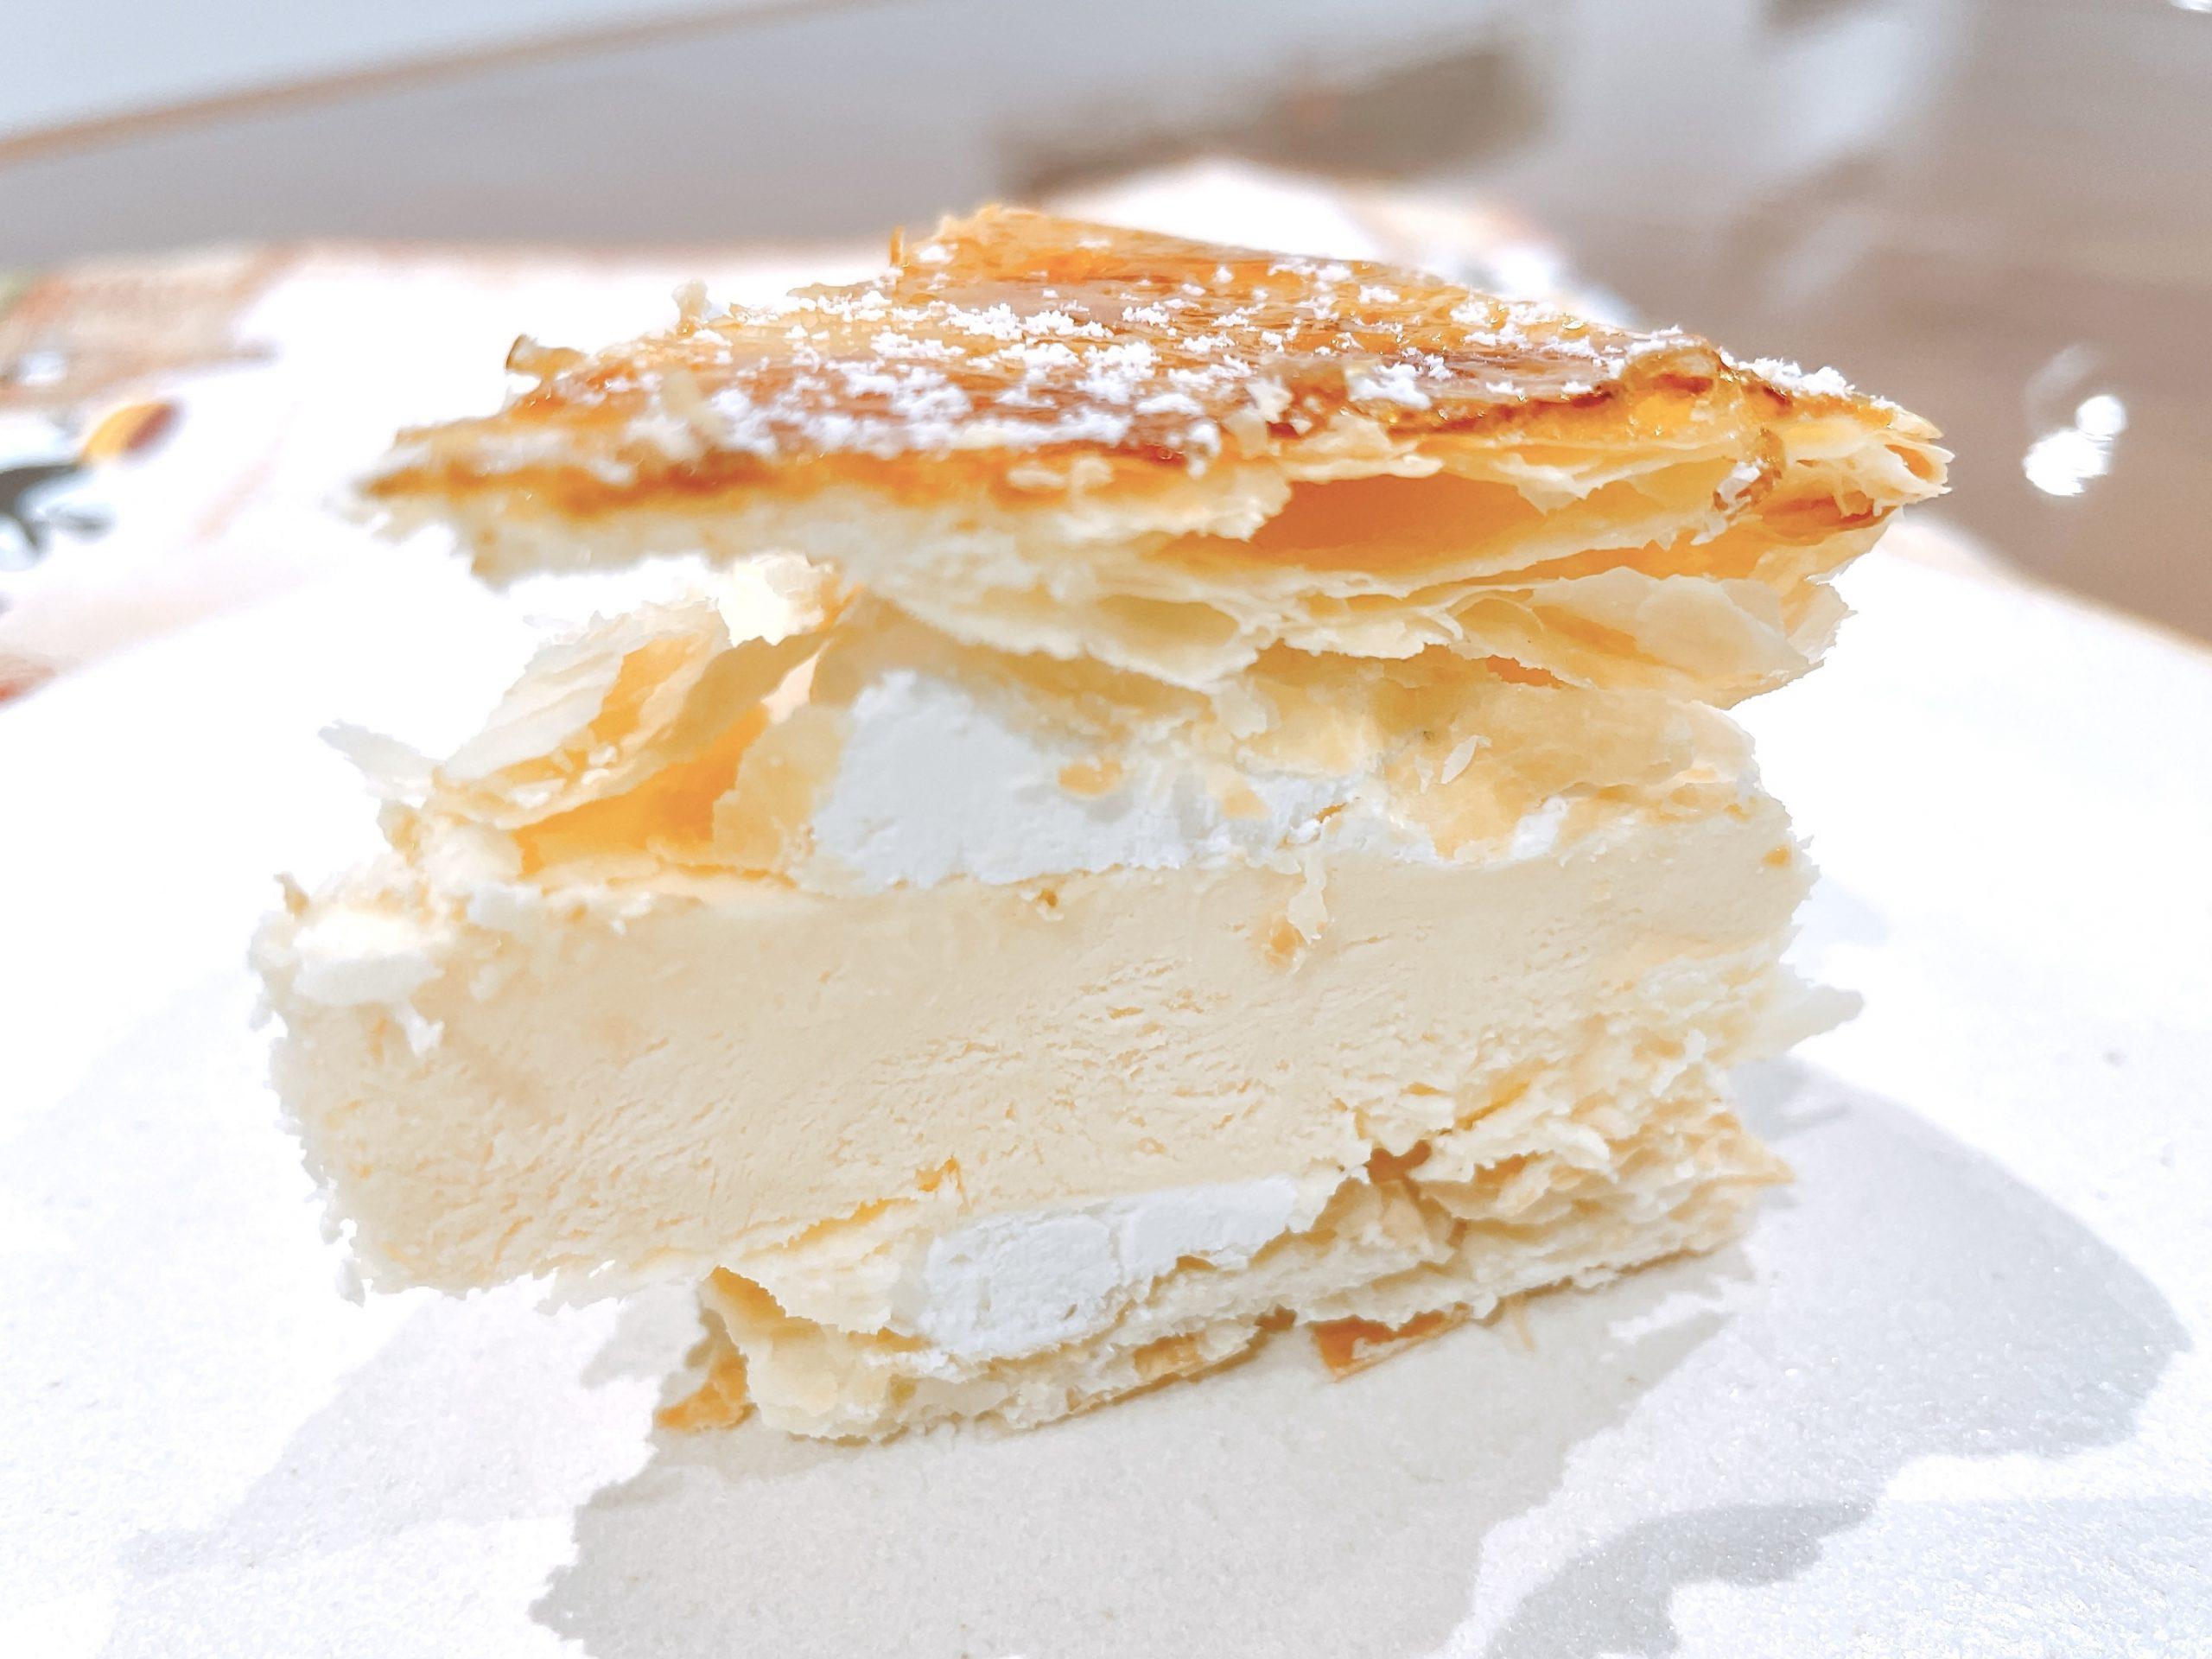 EGOAL(イーゴール)のブリュレチーズケーキは、ちょっと食べにくい